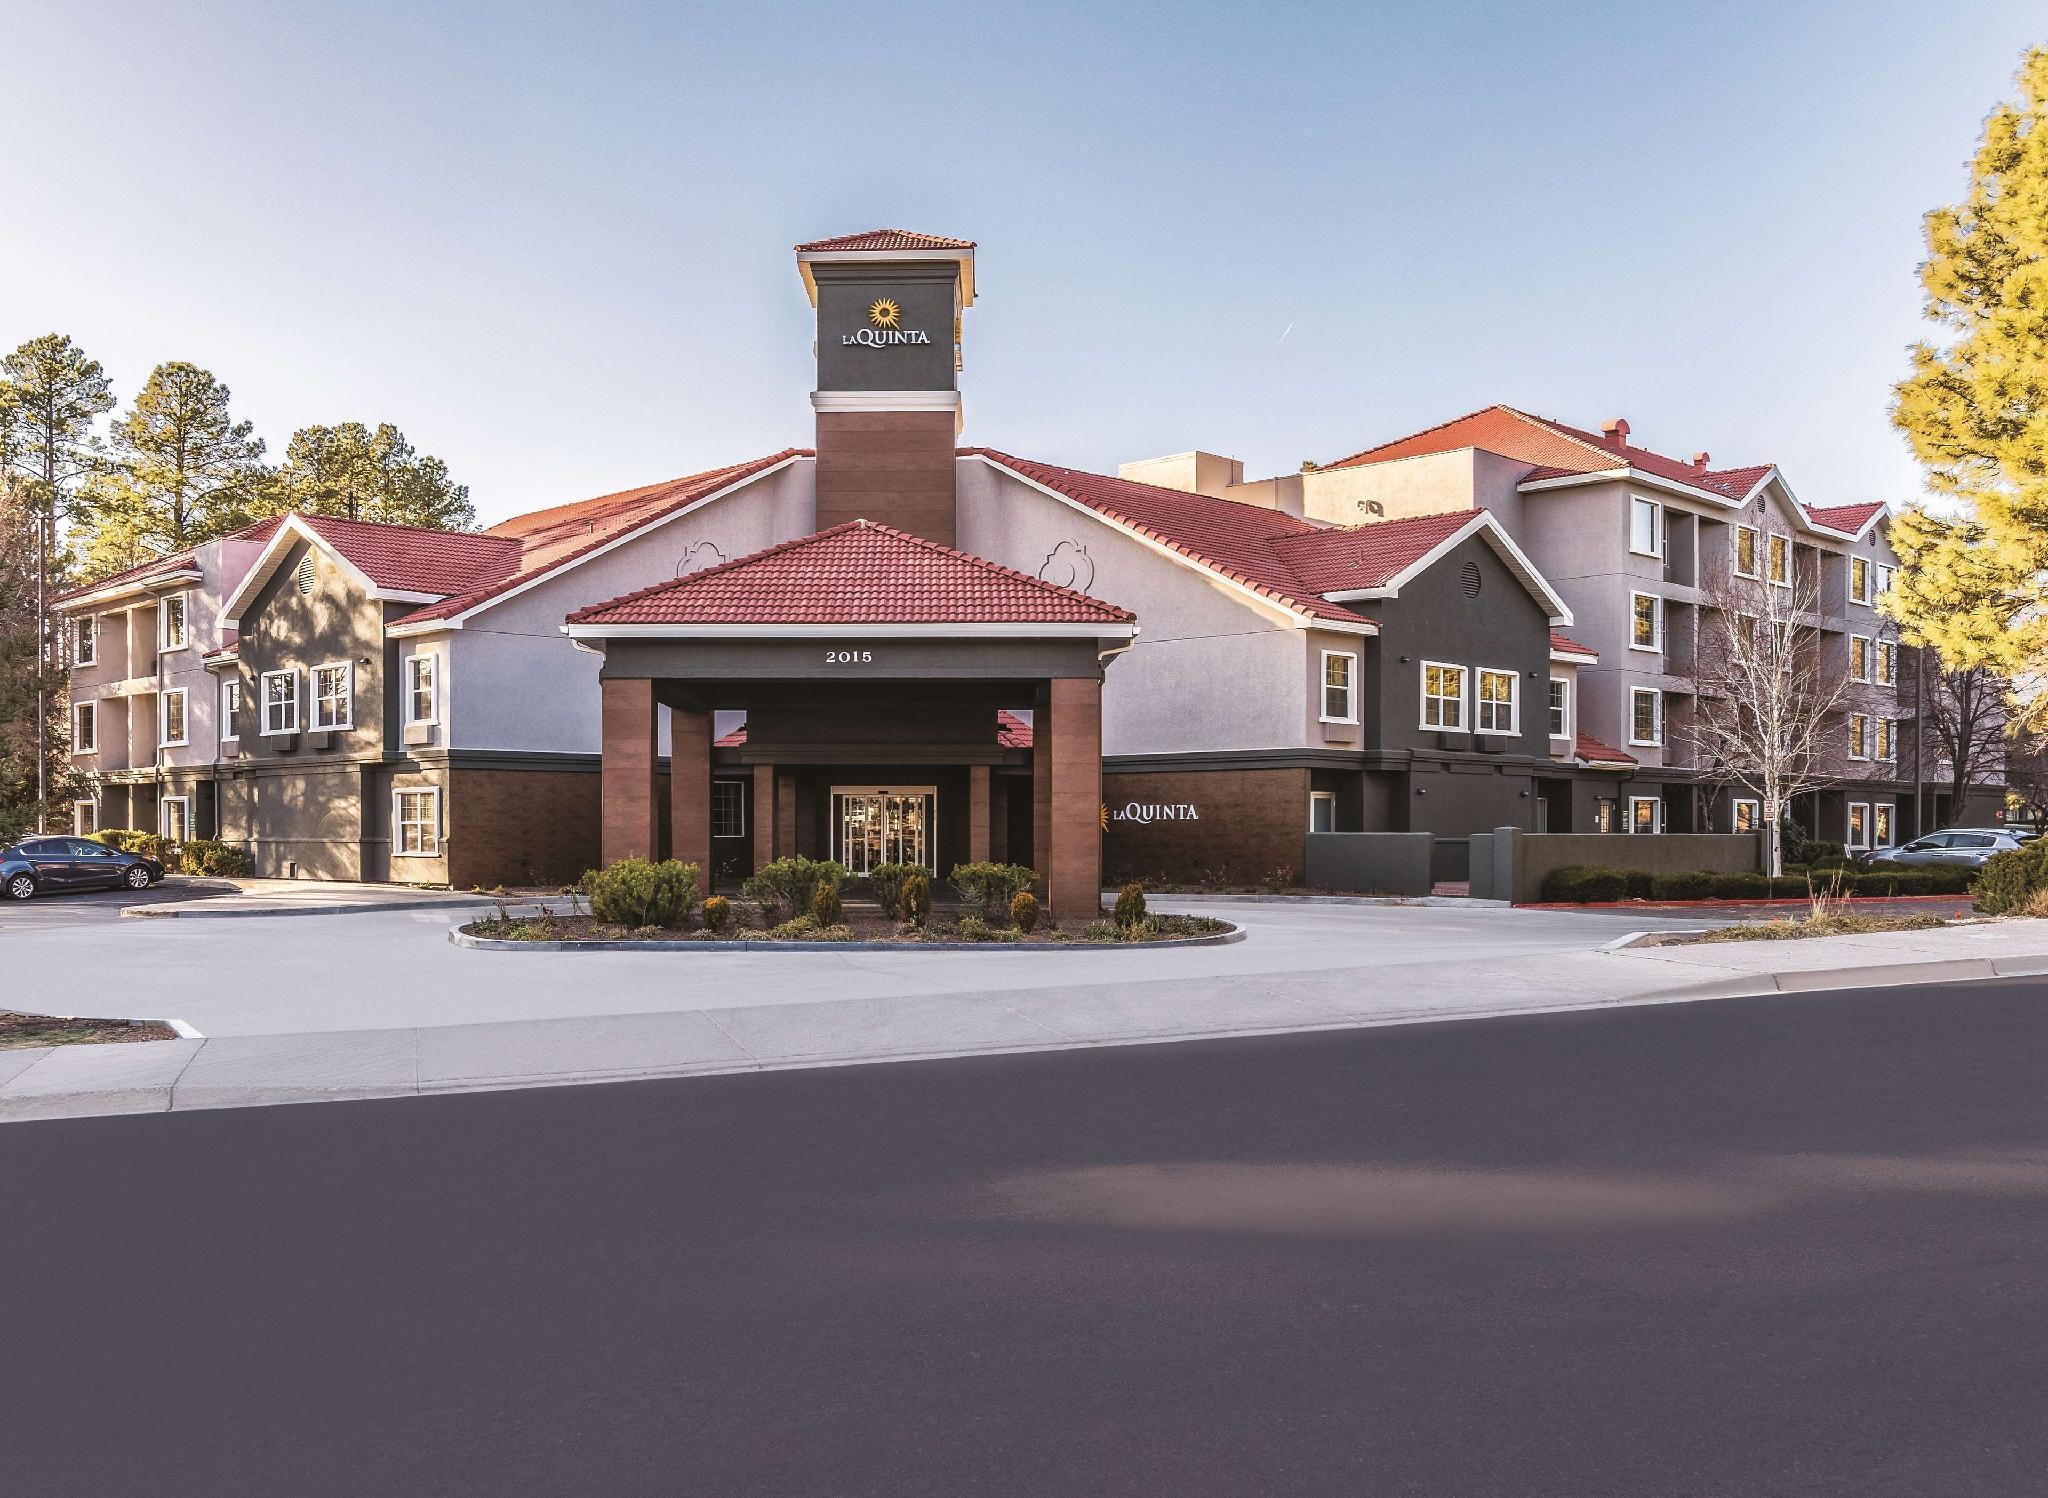 La Quinta Inn And Suites By Wyndham Flagstaff